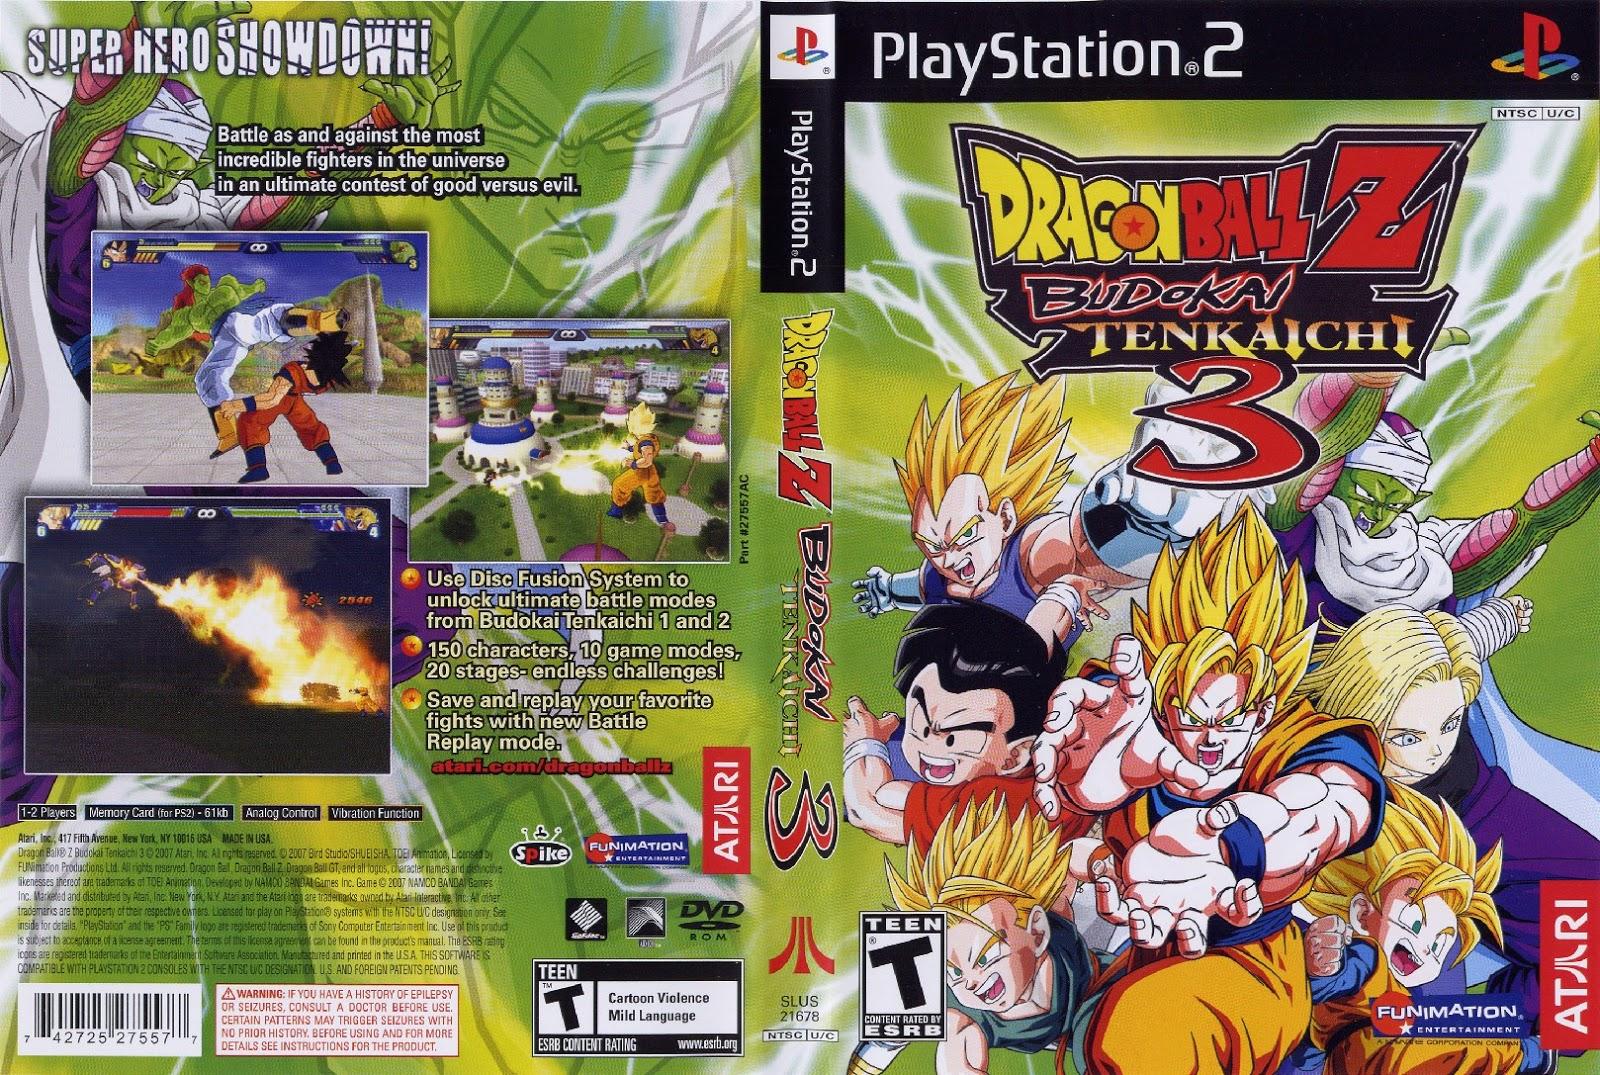 Dragon ball budokai tenkaichi 3 pcsx2 download   Raw cheat